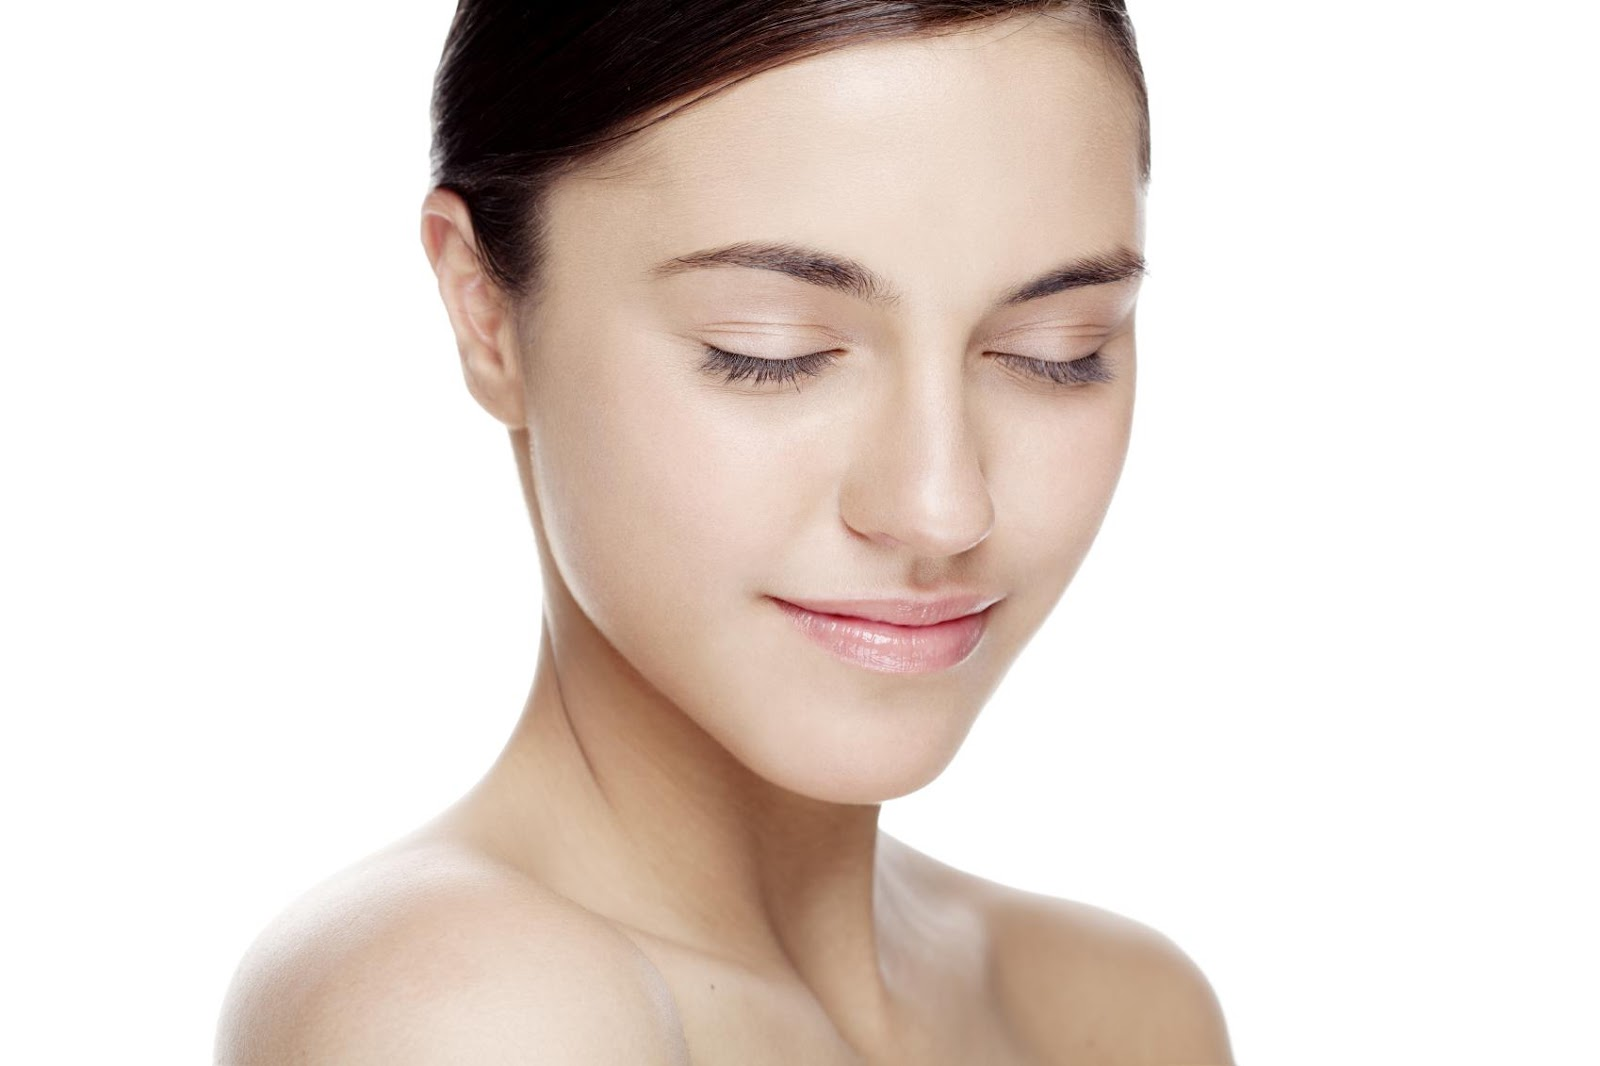 Glutathione-Skin-Whitening - What-Options-Do-We-Have? - Best